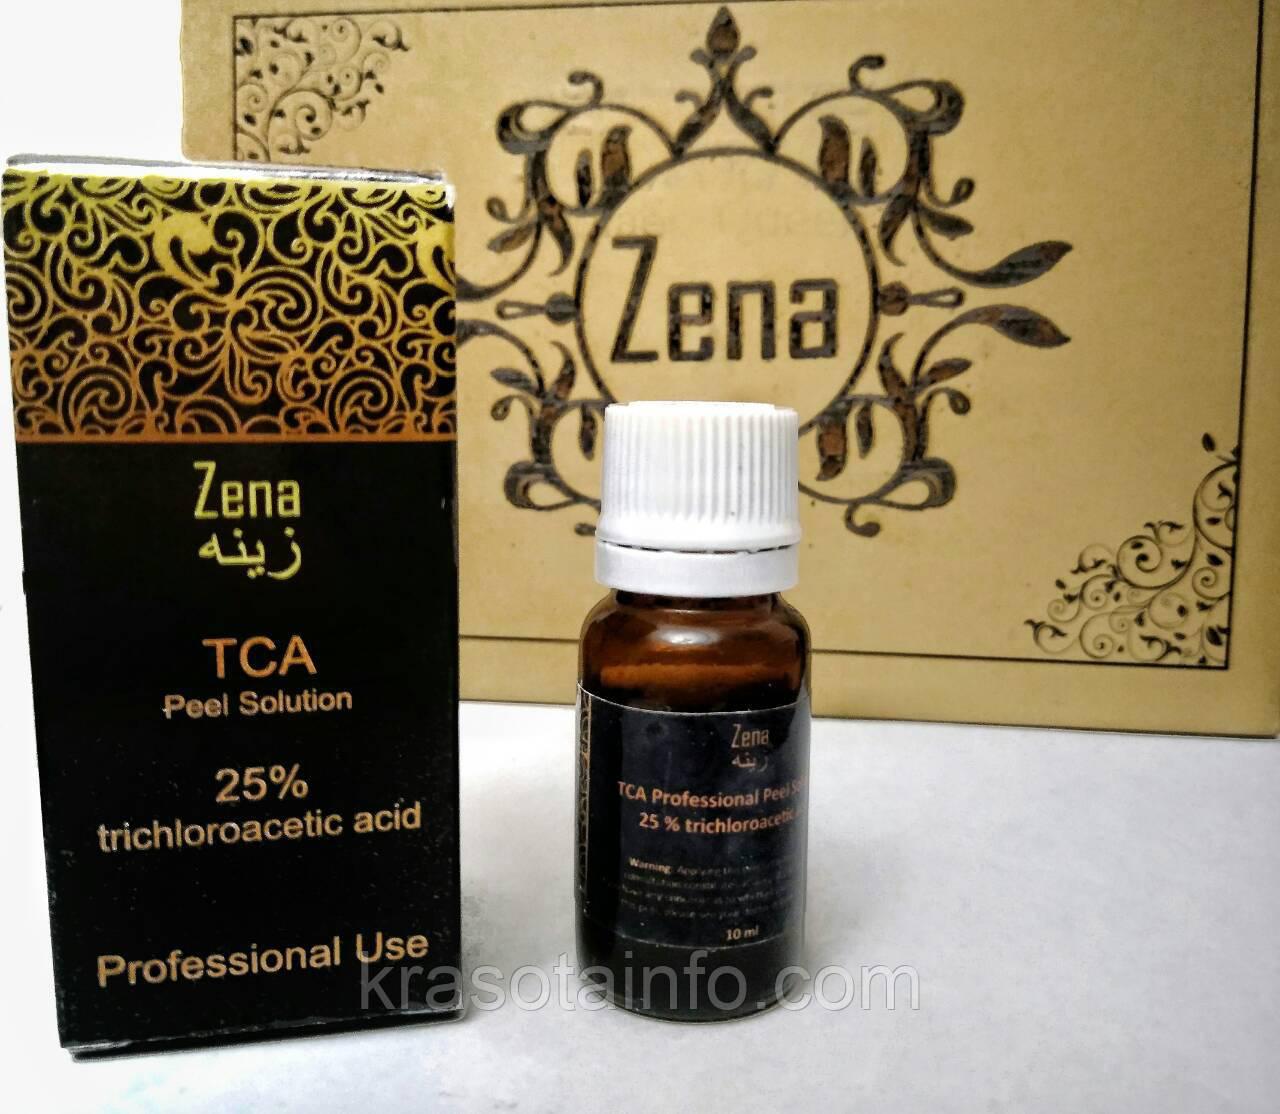 ТСА пилинг 25% - Трихлоруксусная кислота, Zena, 10 мл.